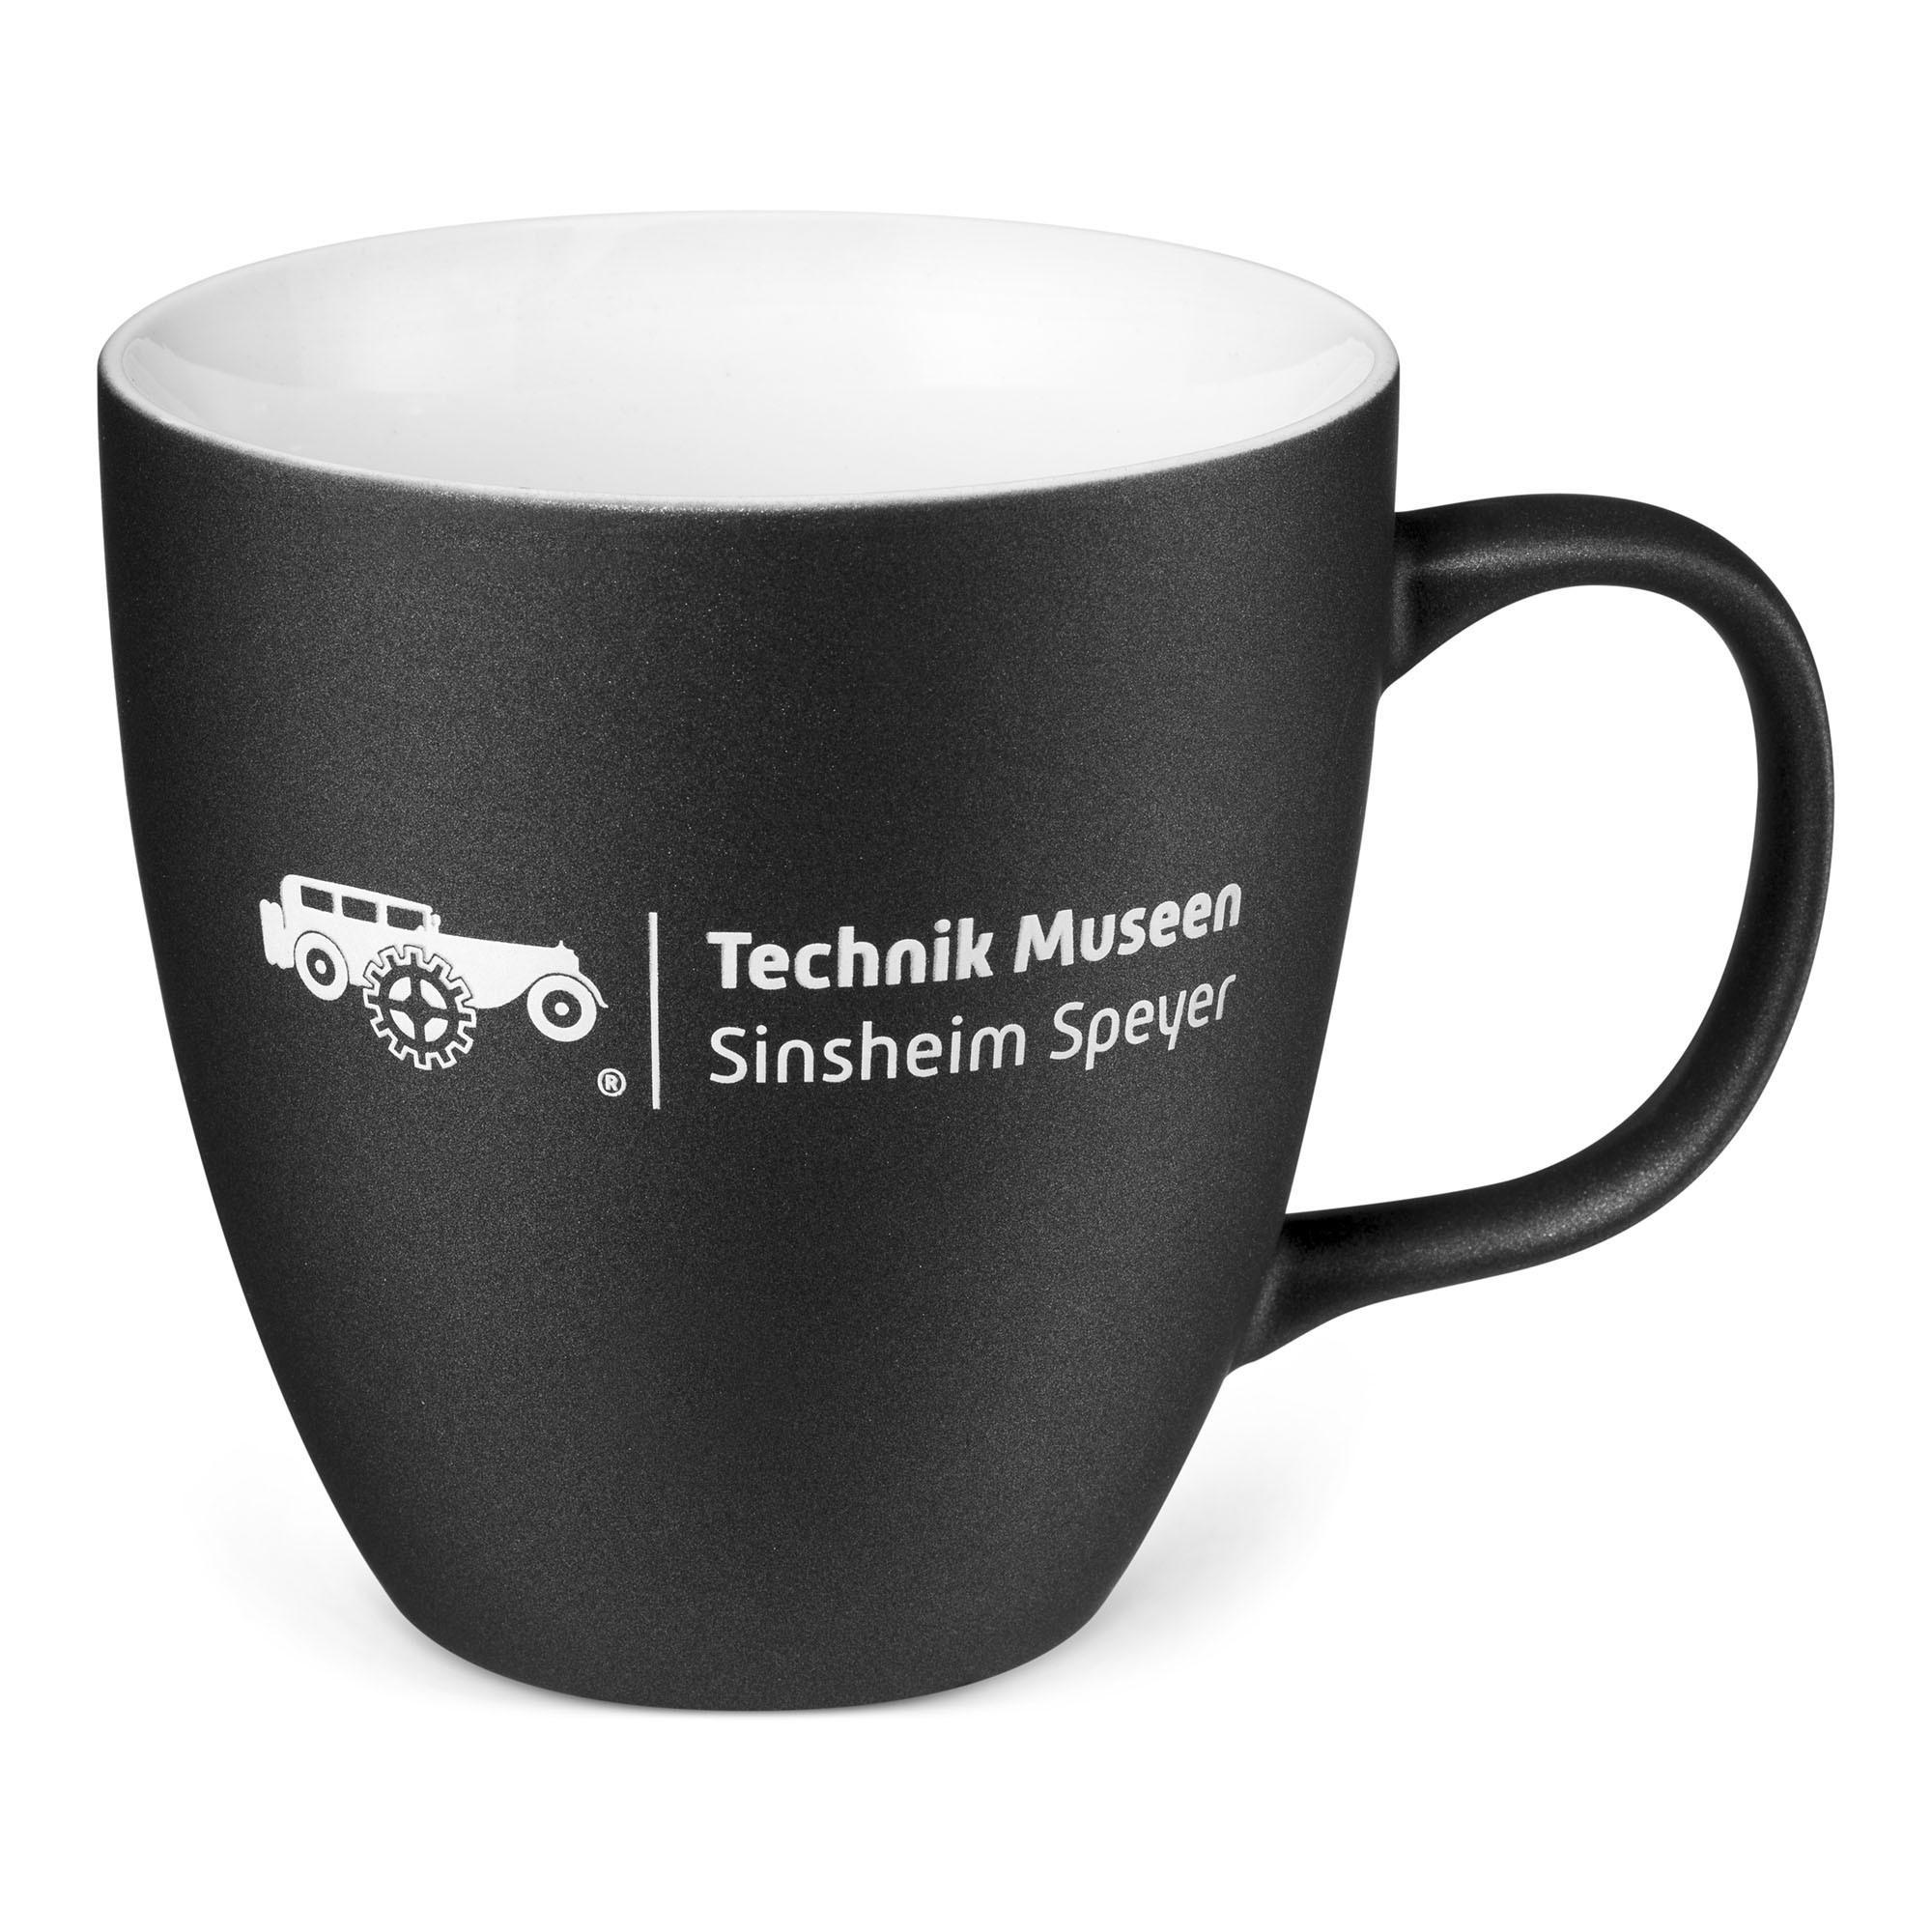 Black mug - Technik Museen Sinsheim Speyer